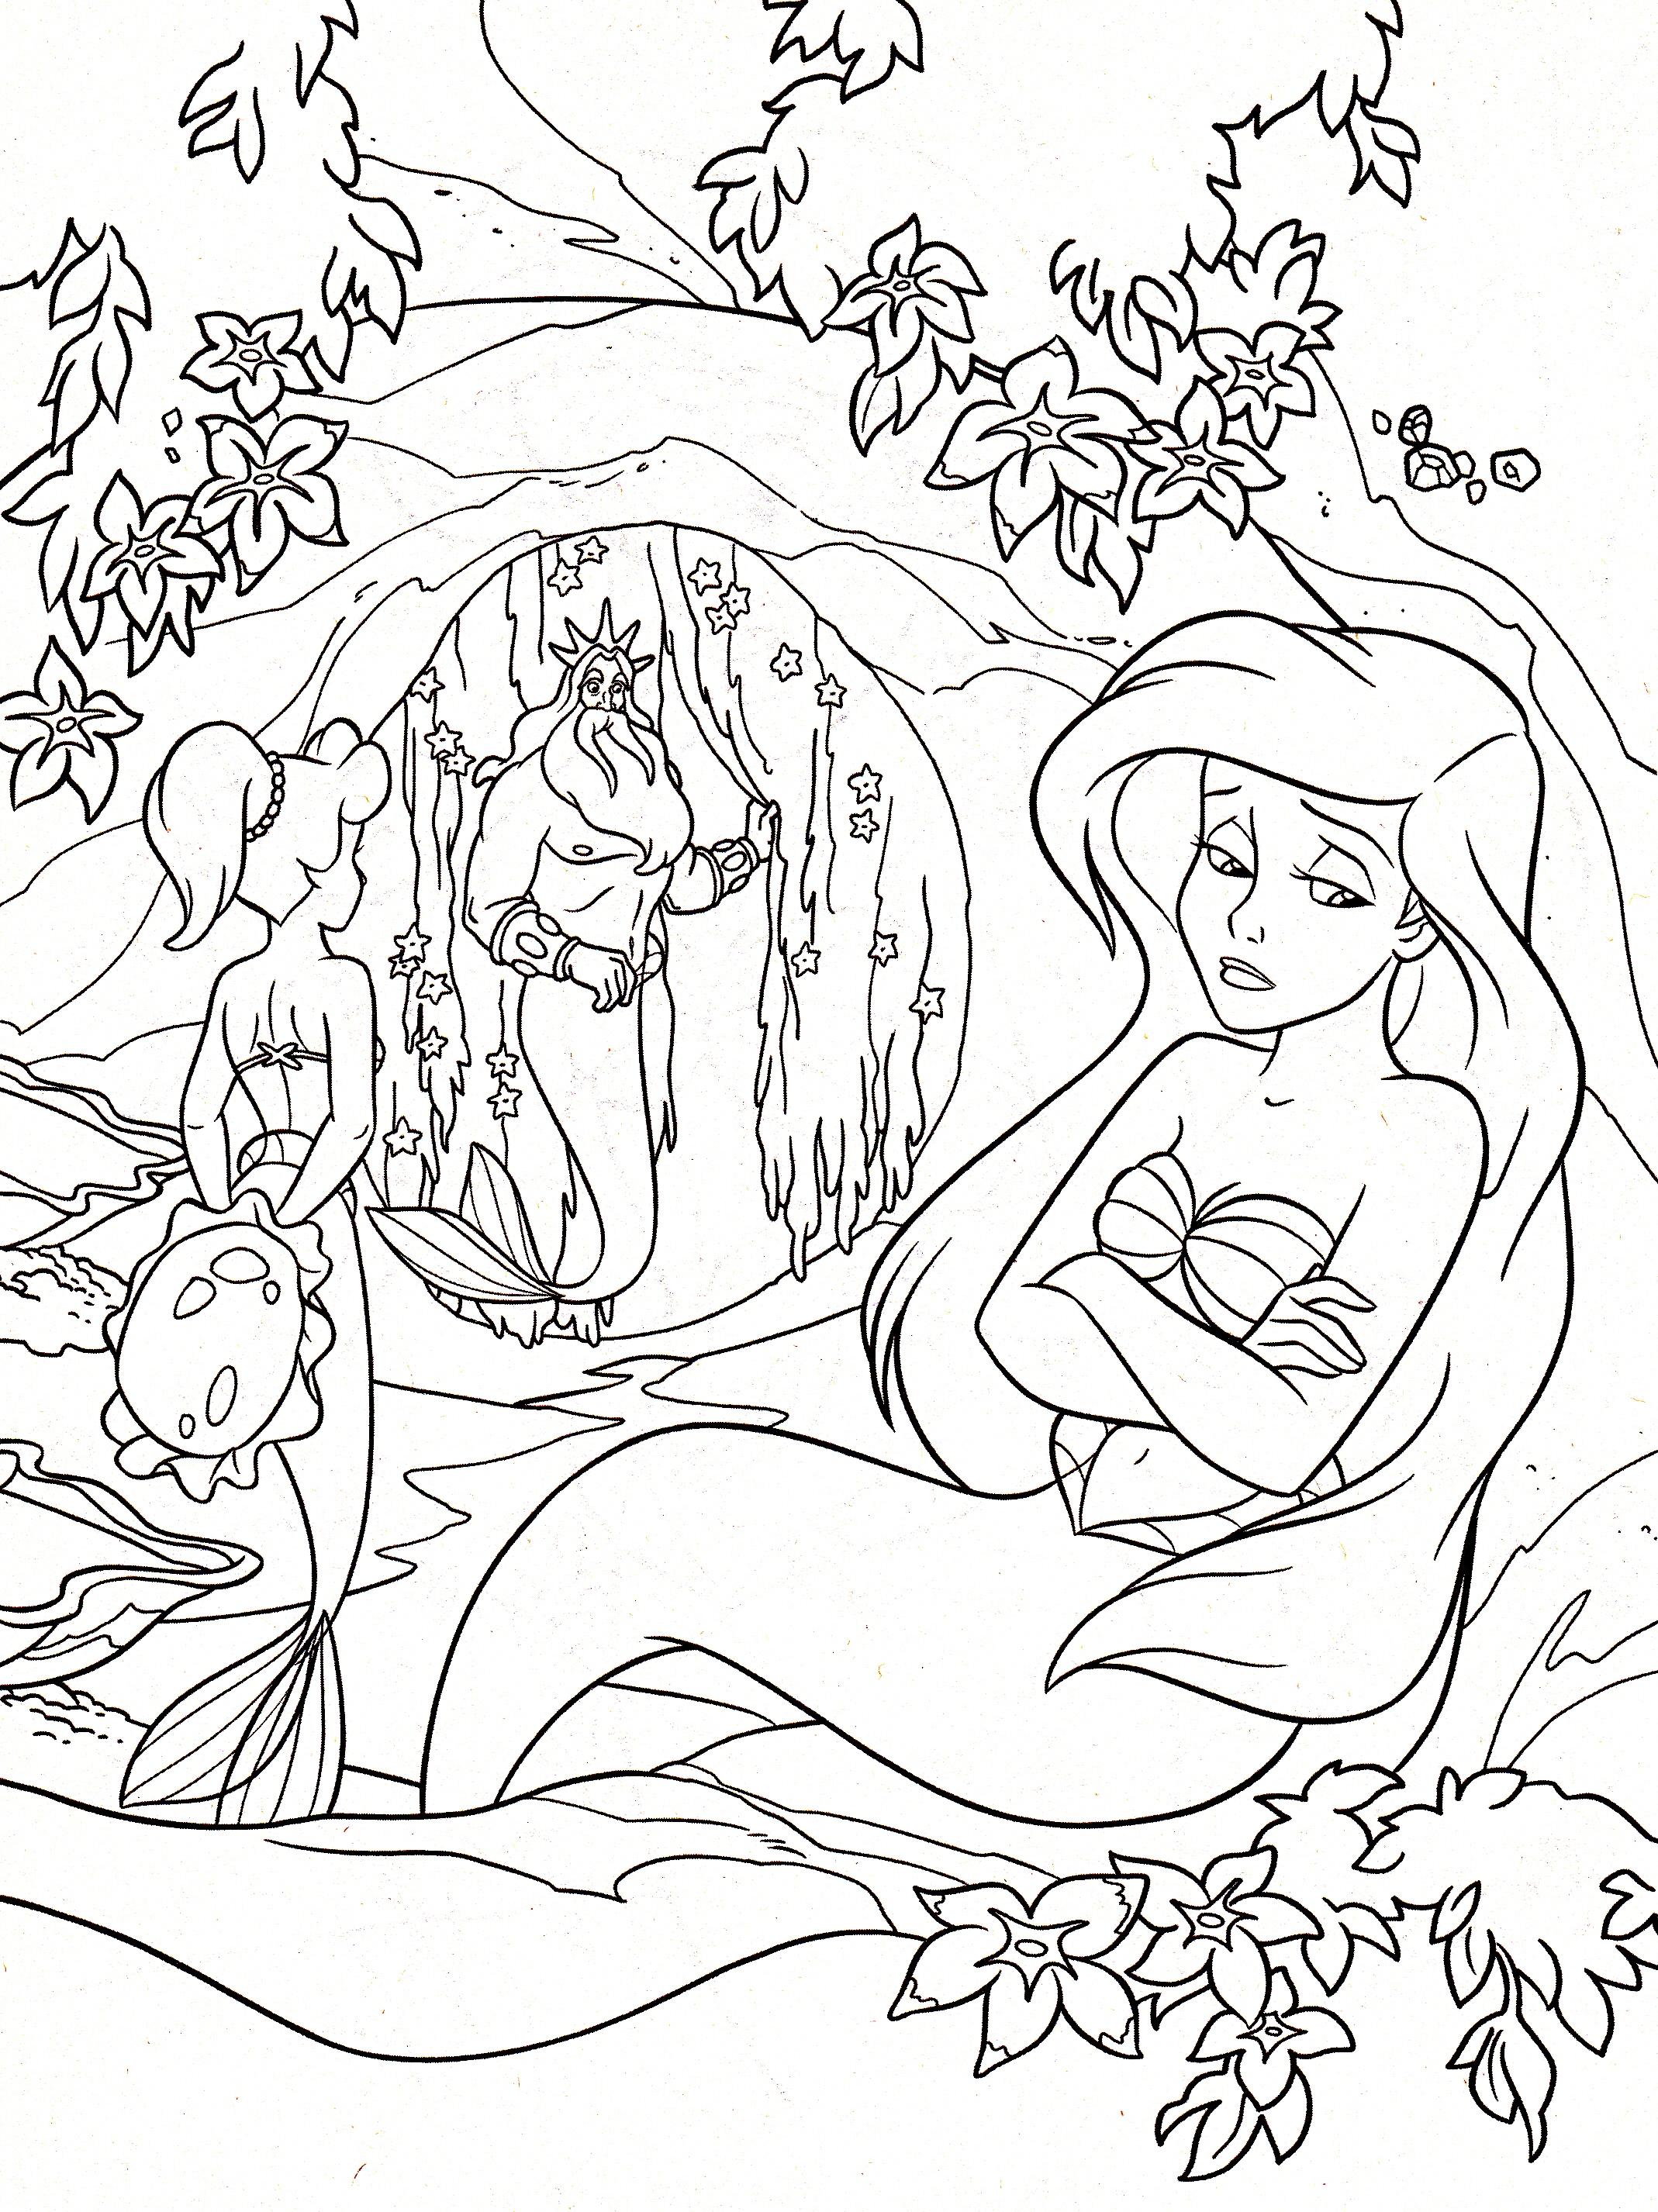 Disney Princess Adult Coloring Pages At Getdrawings Free Download